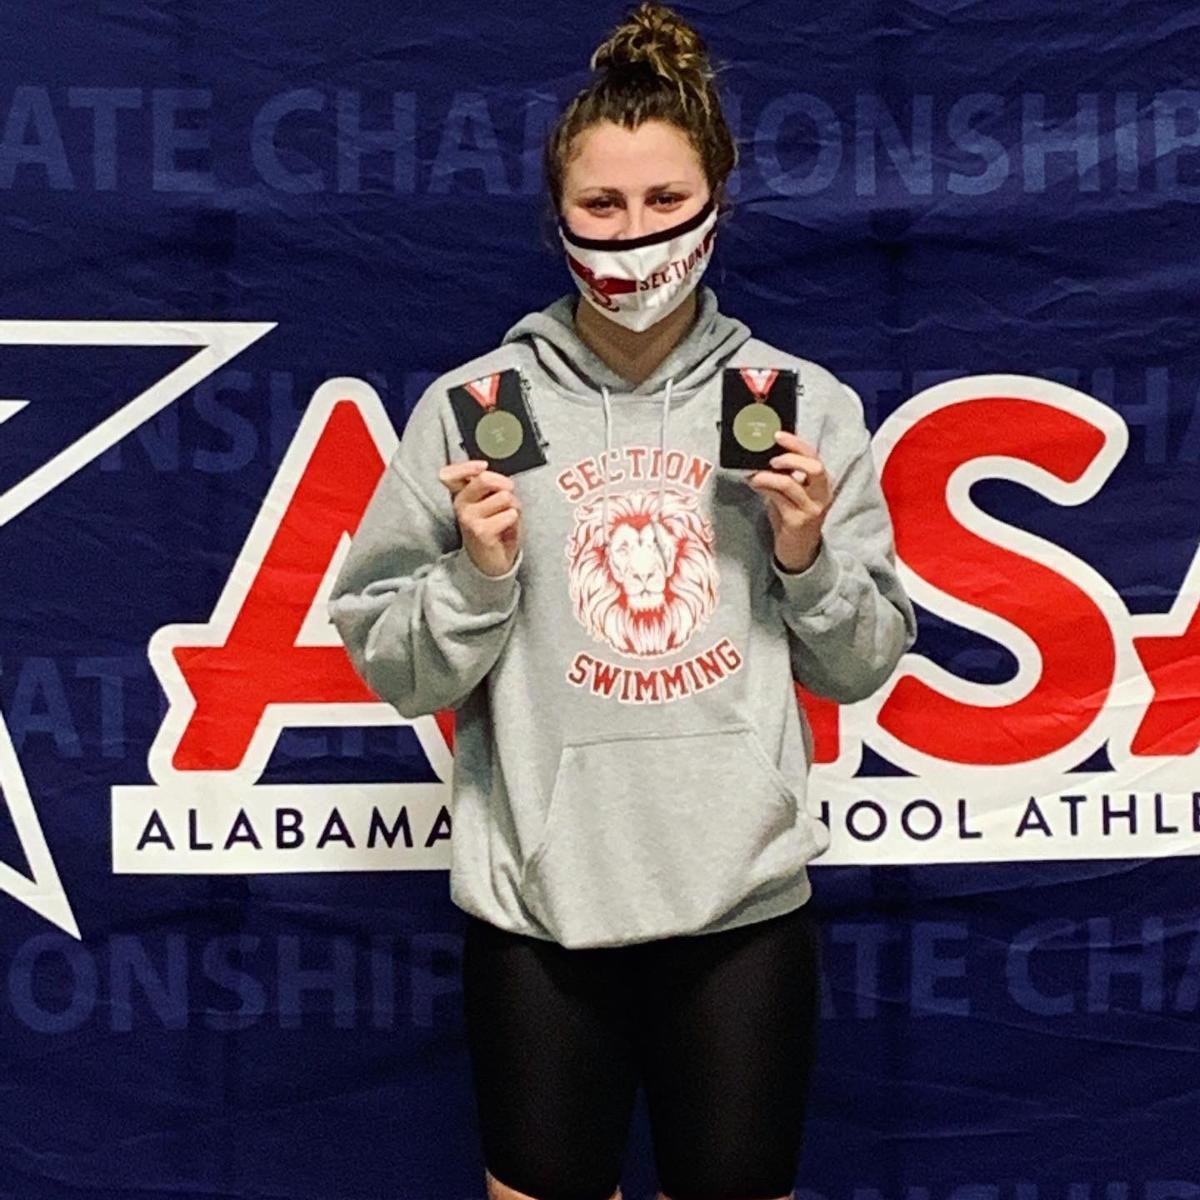 MAggie Ella Robbins state champ